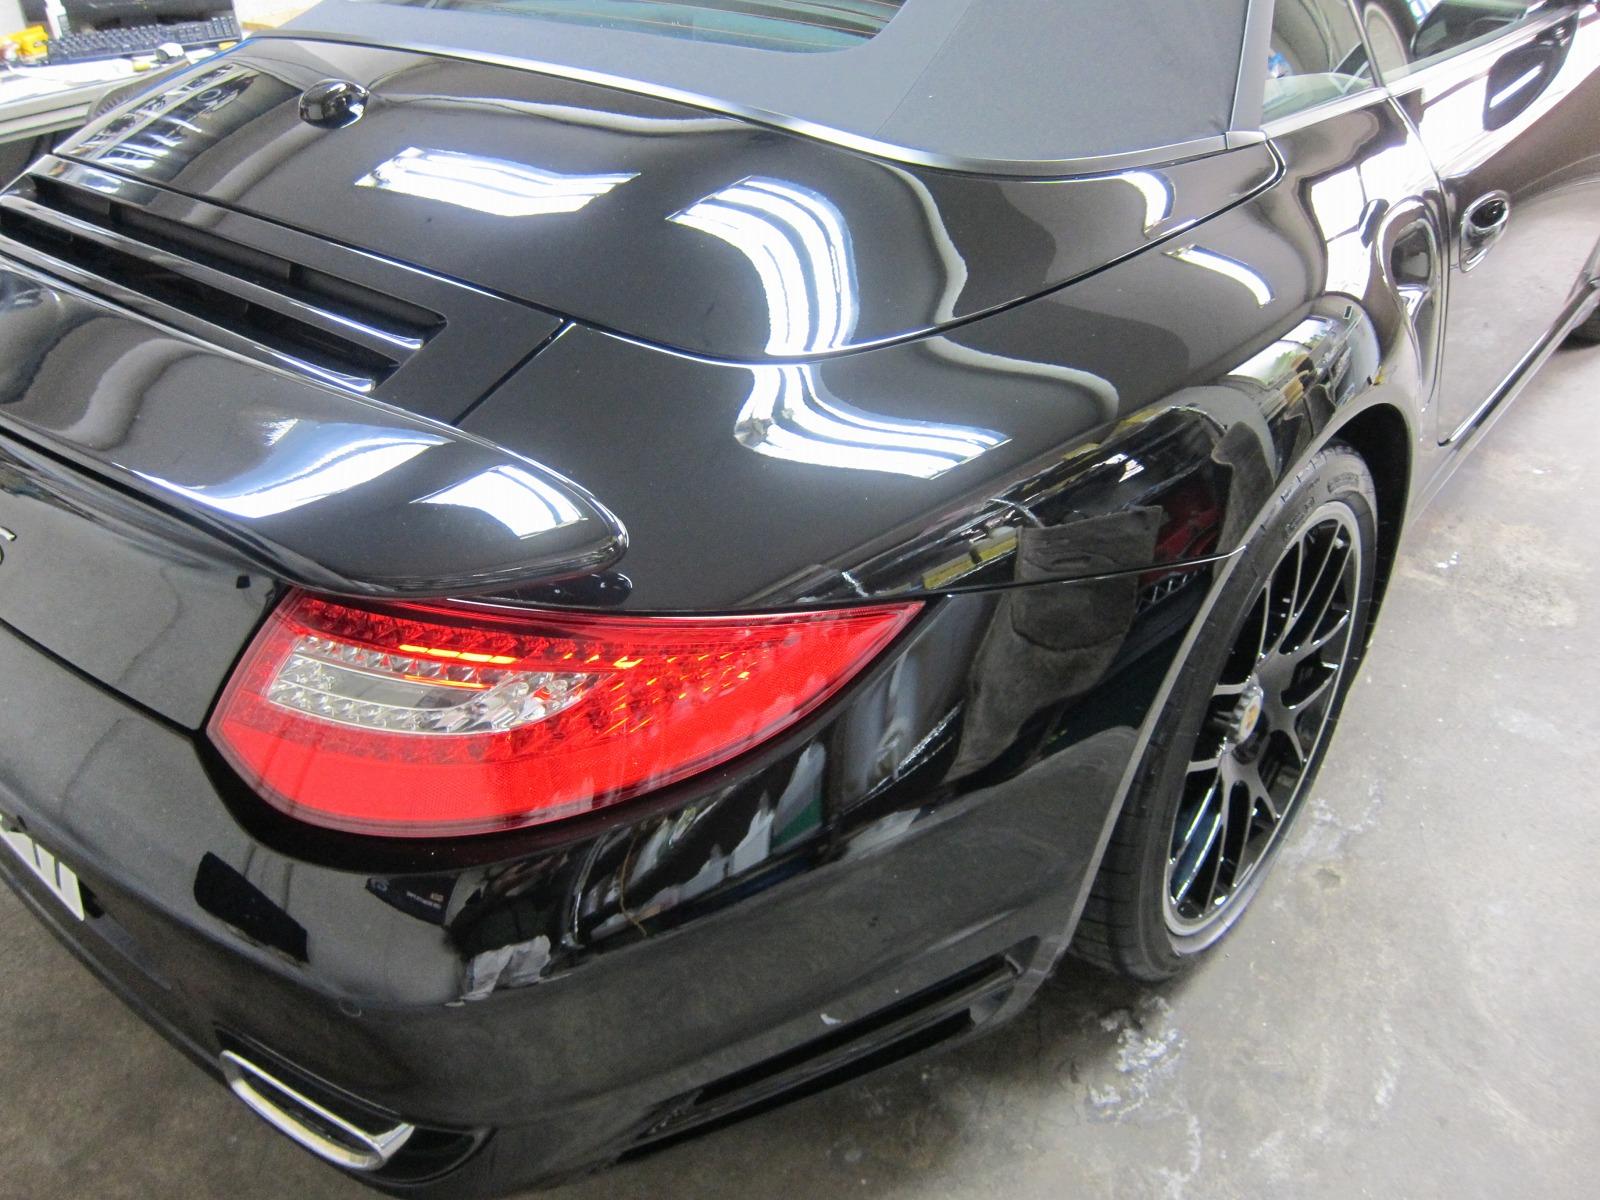 20141102-porsche-911-turbos-05